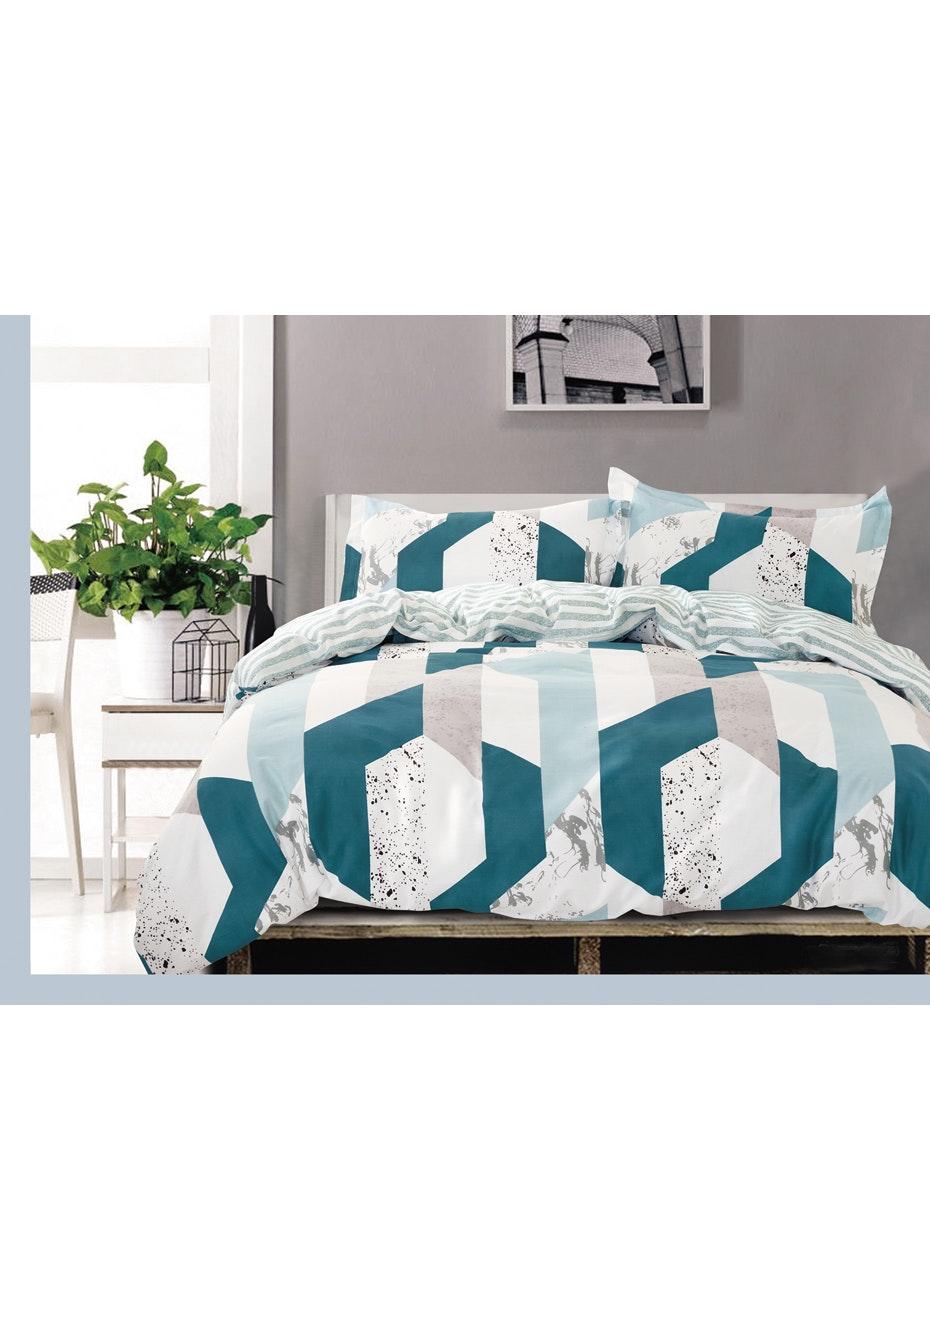 Marble Cove Quilt Cover Set - Reversible Design - 100% Cotton - Queen Bed